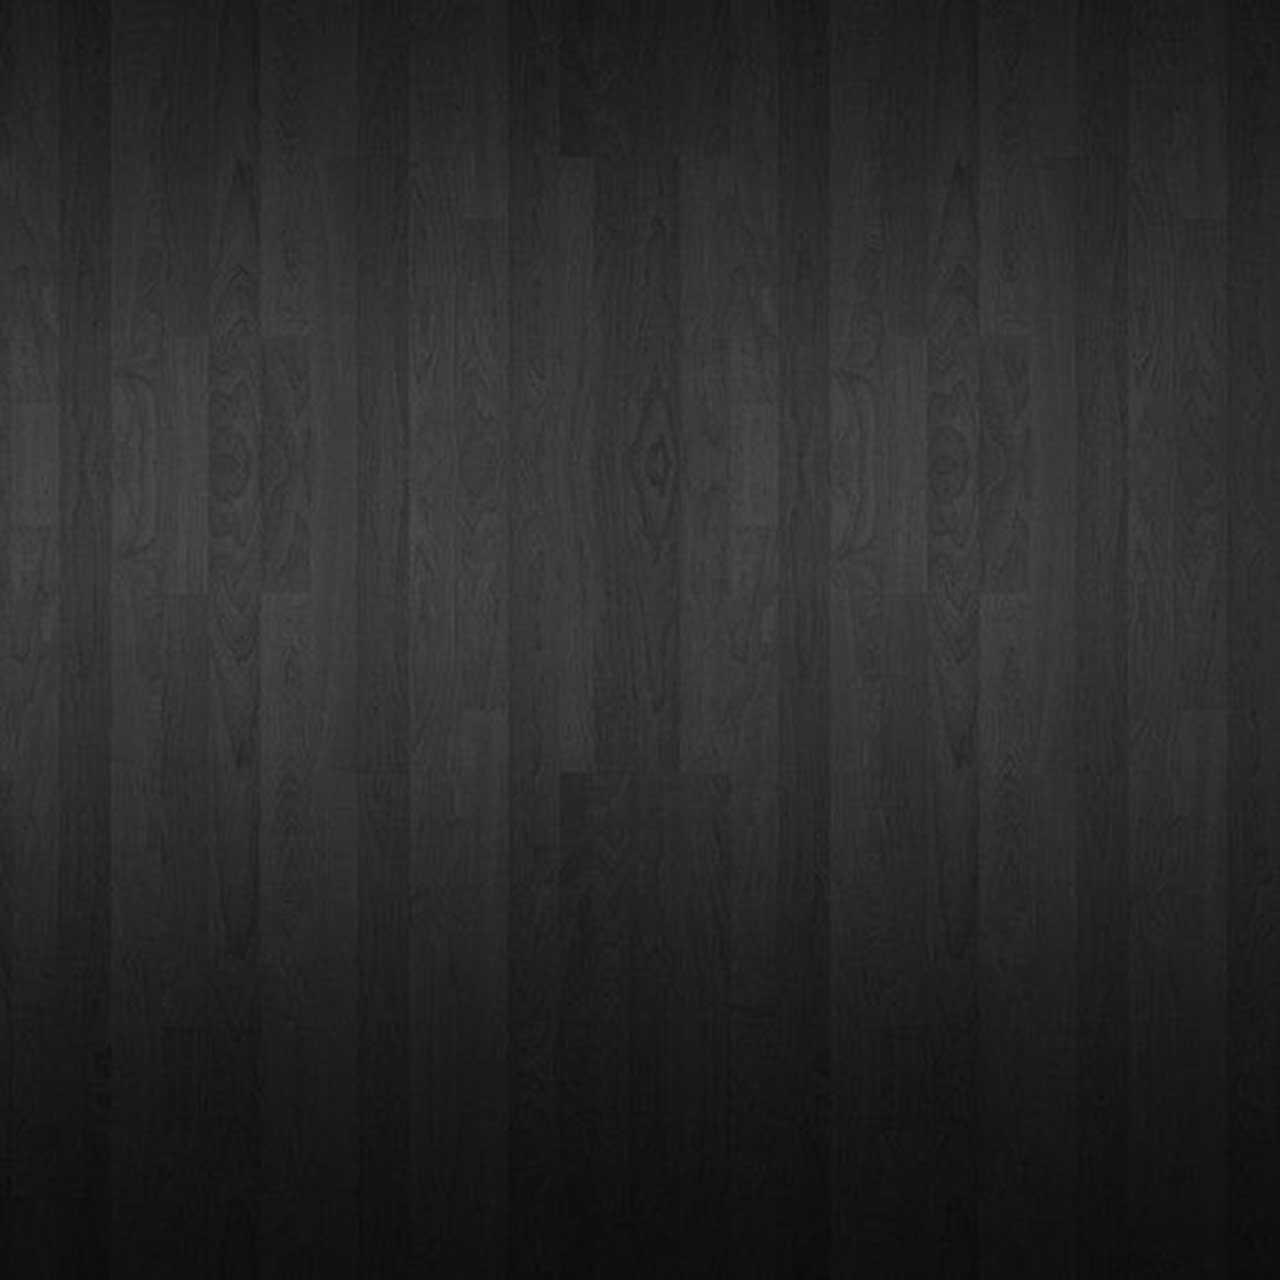 wooden planks wallpaper